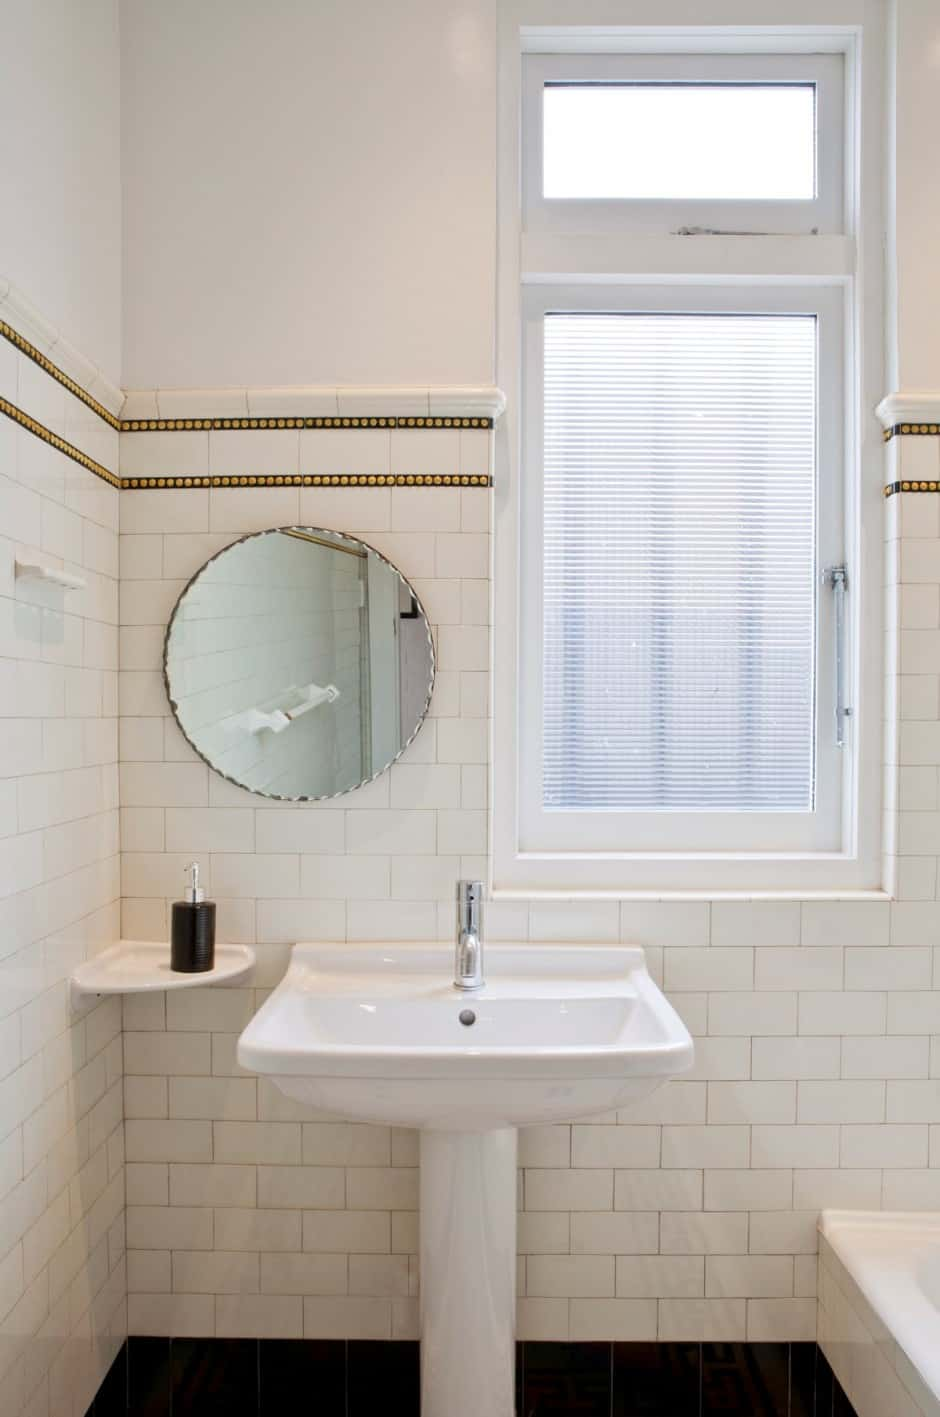 Contemporary Renovation Of A Timeworn House - Bathroom renovation time